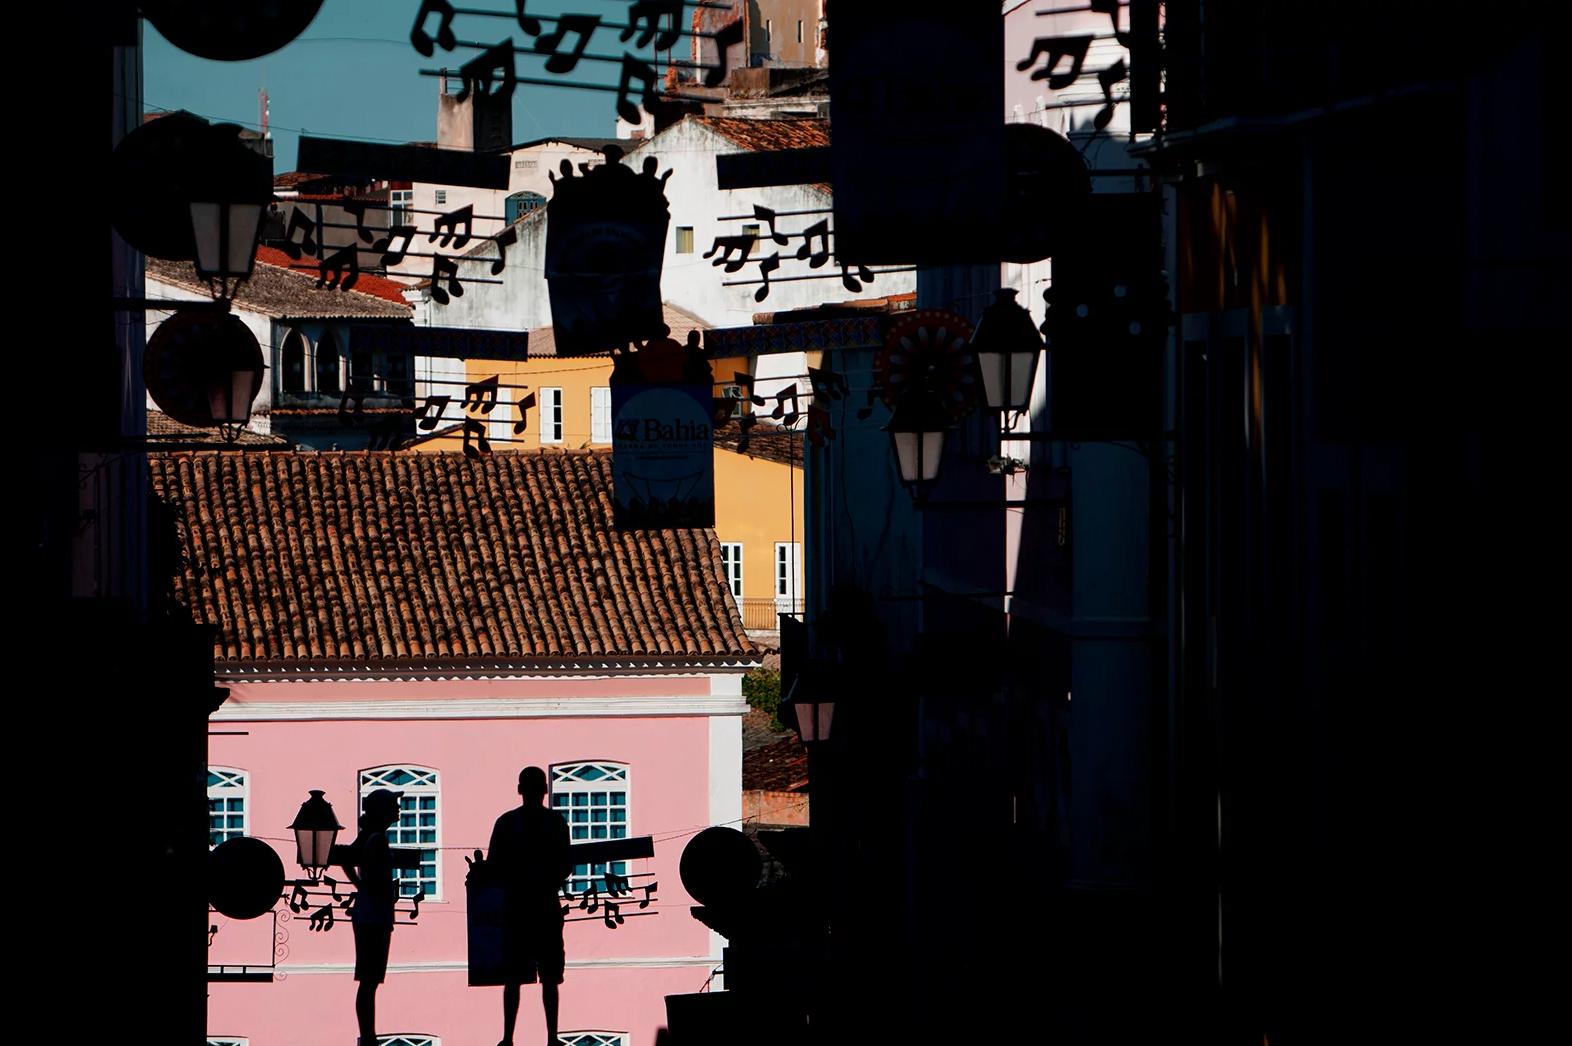 color photo by Alex Almeida from Brazil Tropical light. street.scene.